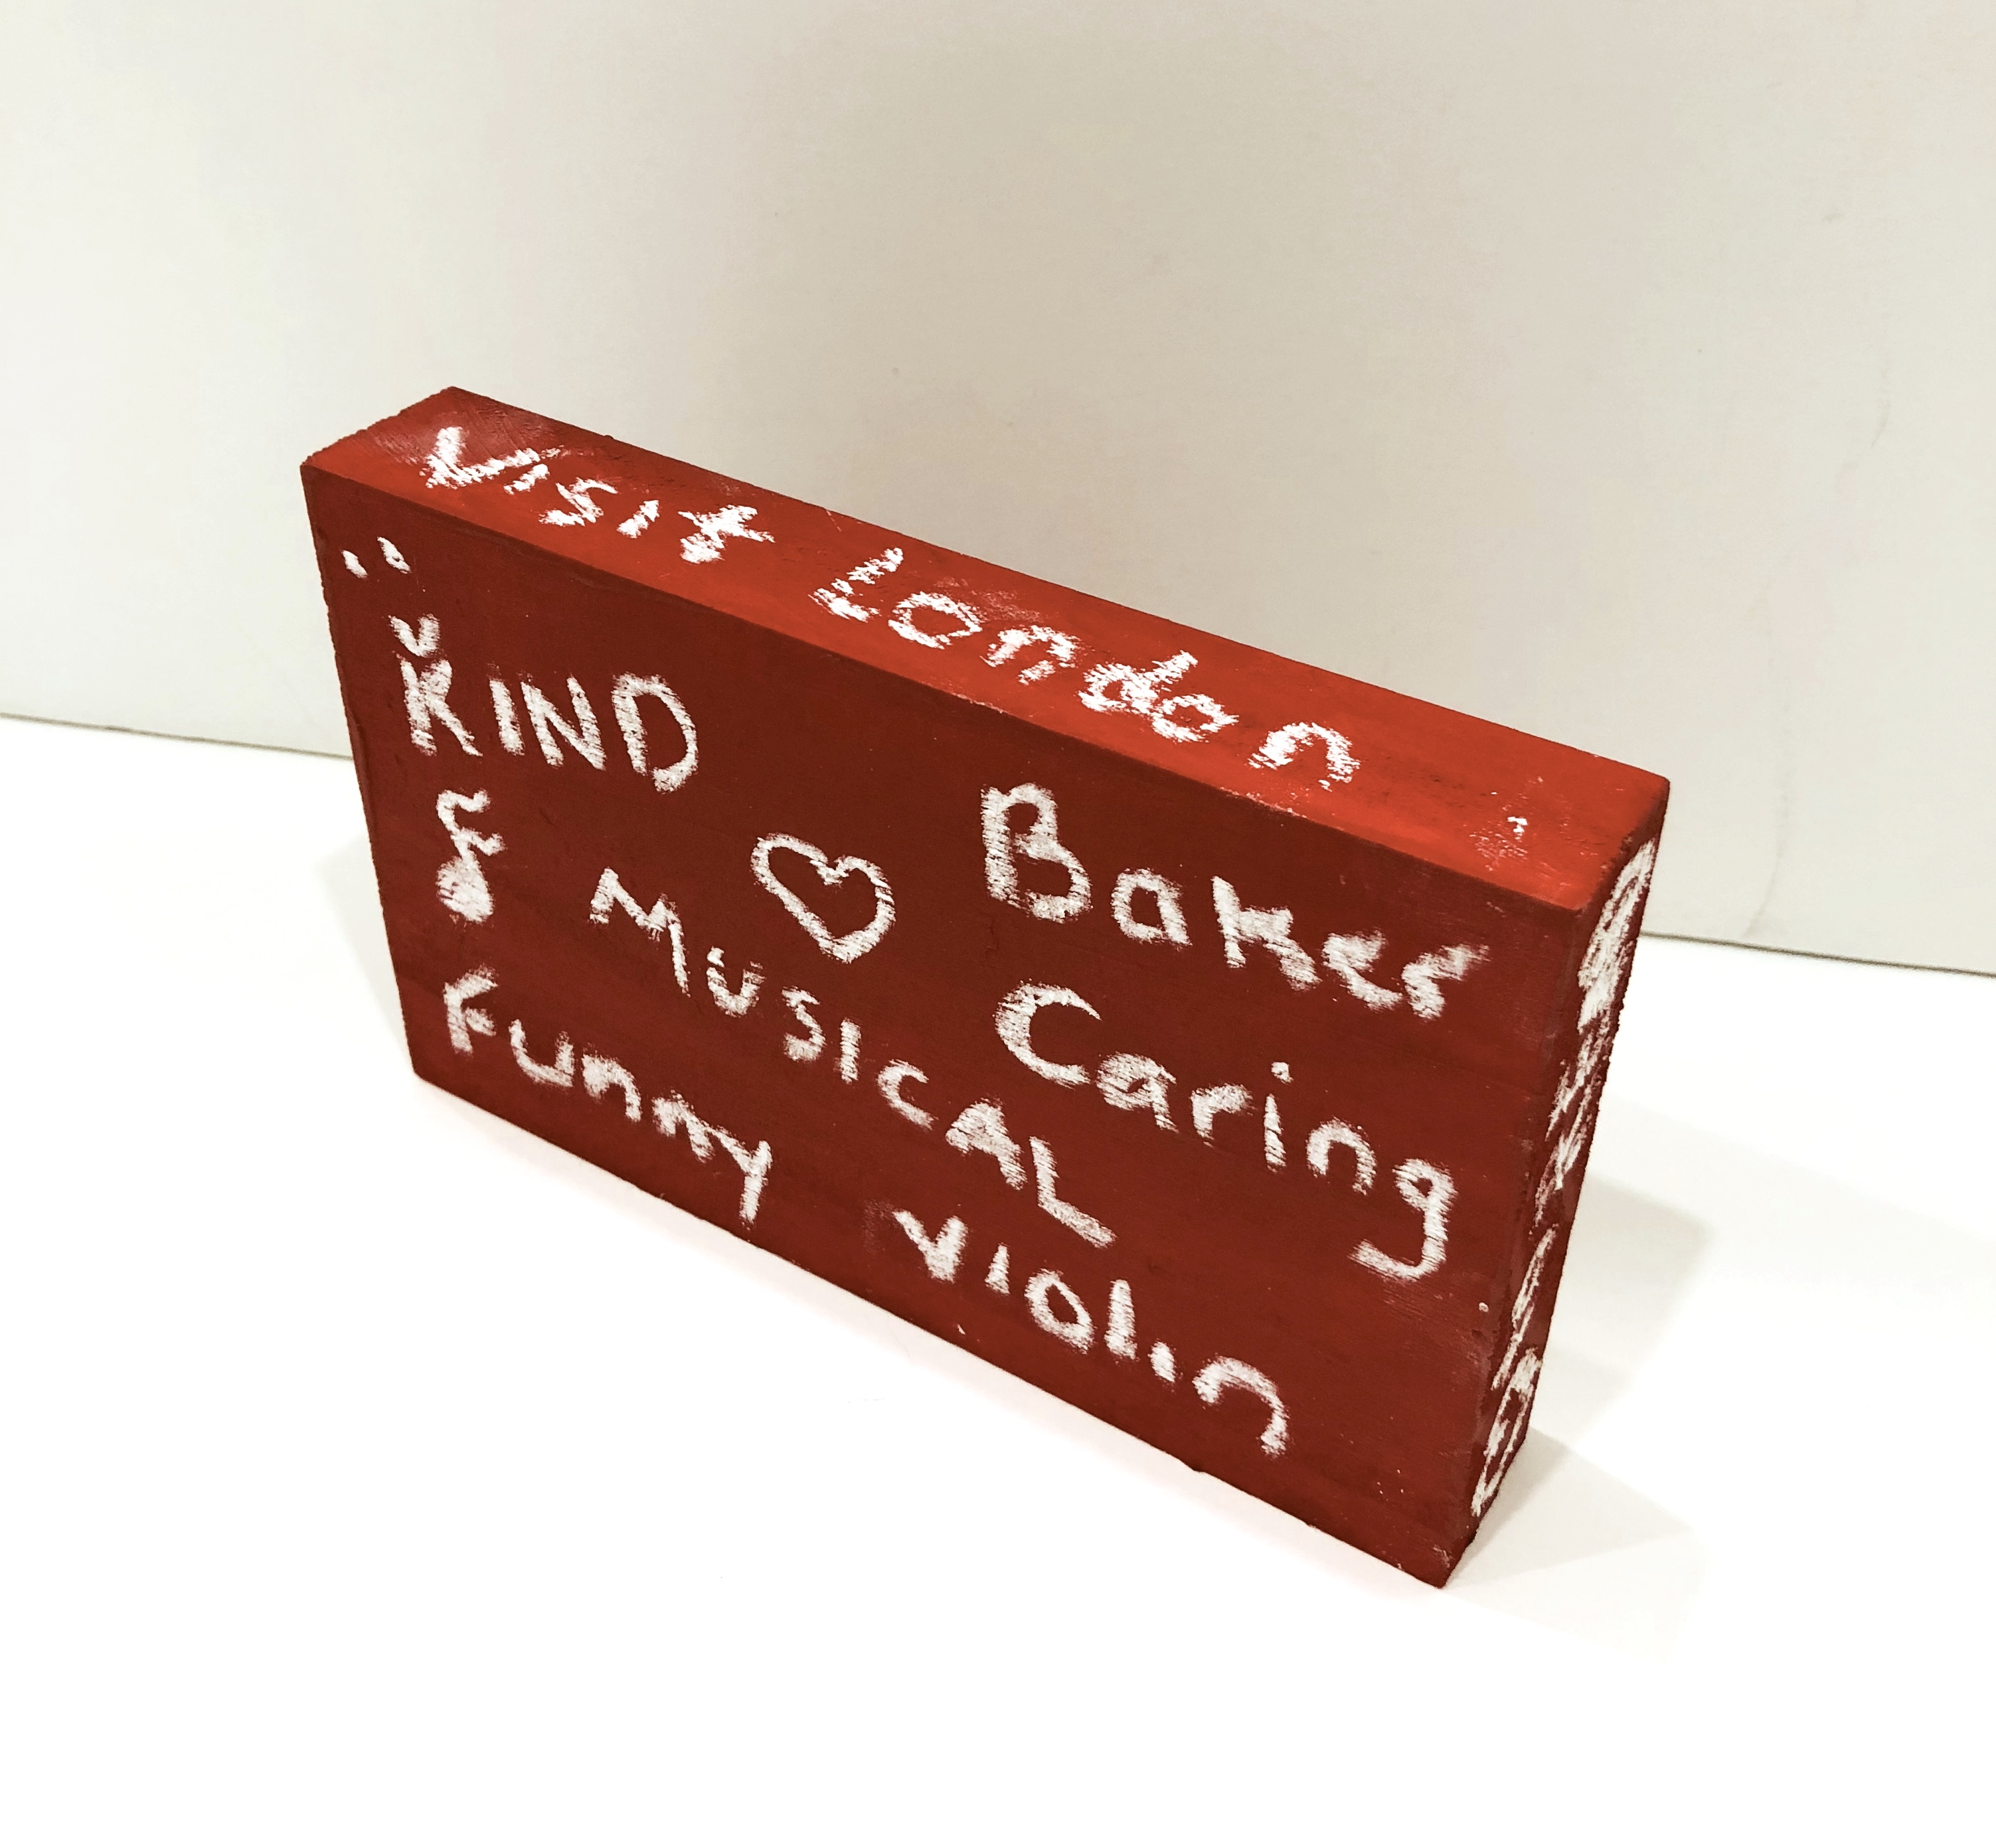 celebrate-picture-books-picture-book-review-brick-craft